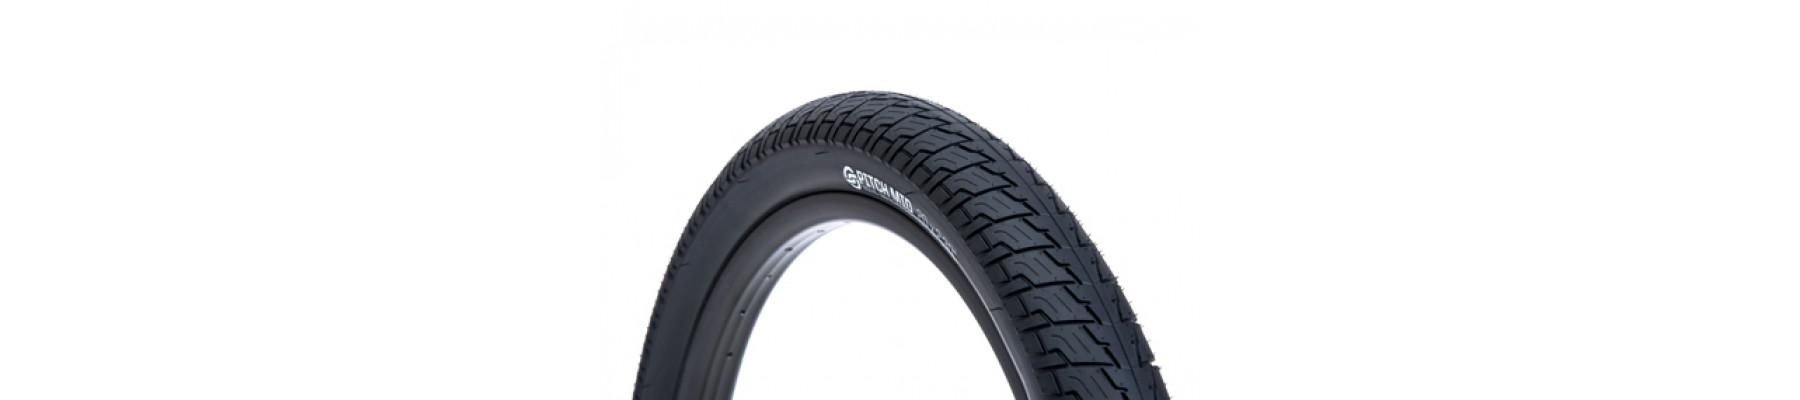 Salt Pitch MID tire  Black 2.3